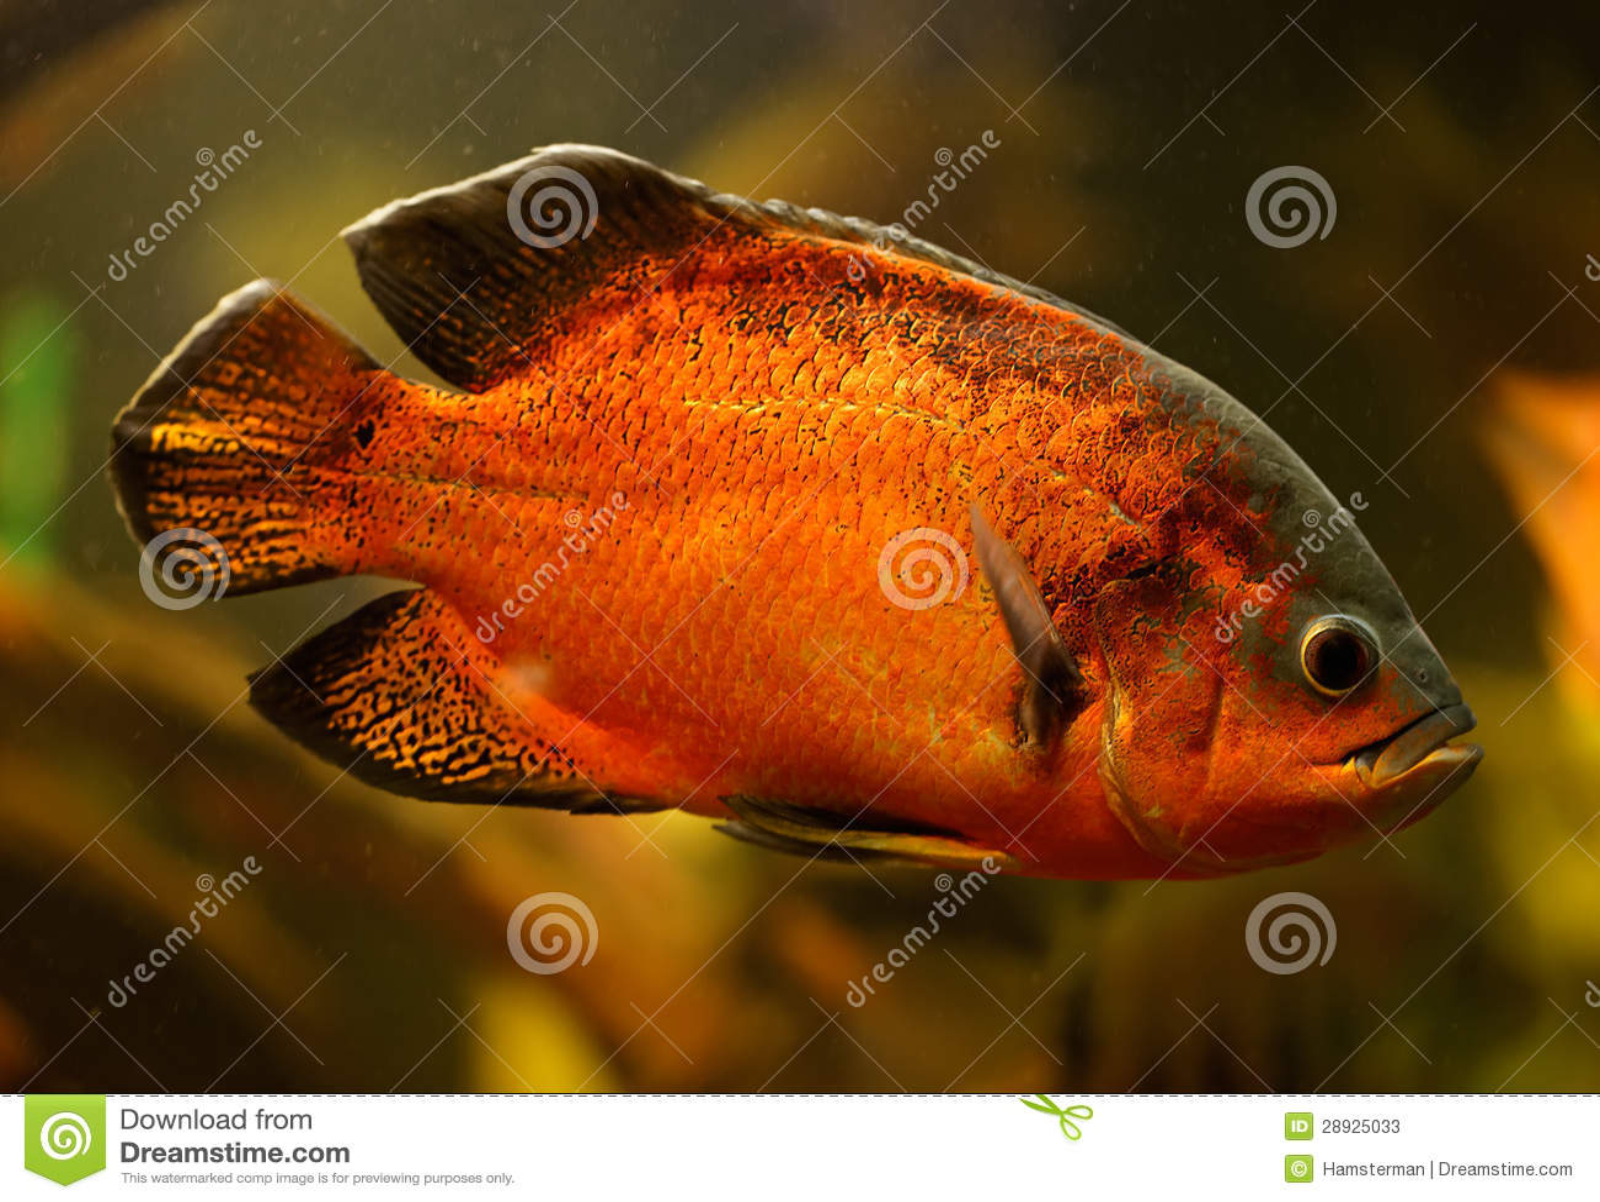 Oscar : Oscar Fish (Astronotus Ocellatus) Stock Photos - Image: 28925033